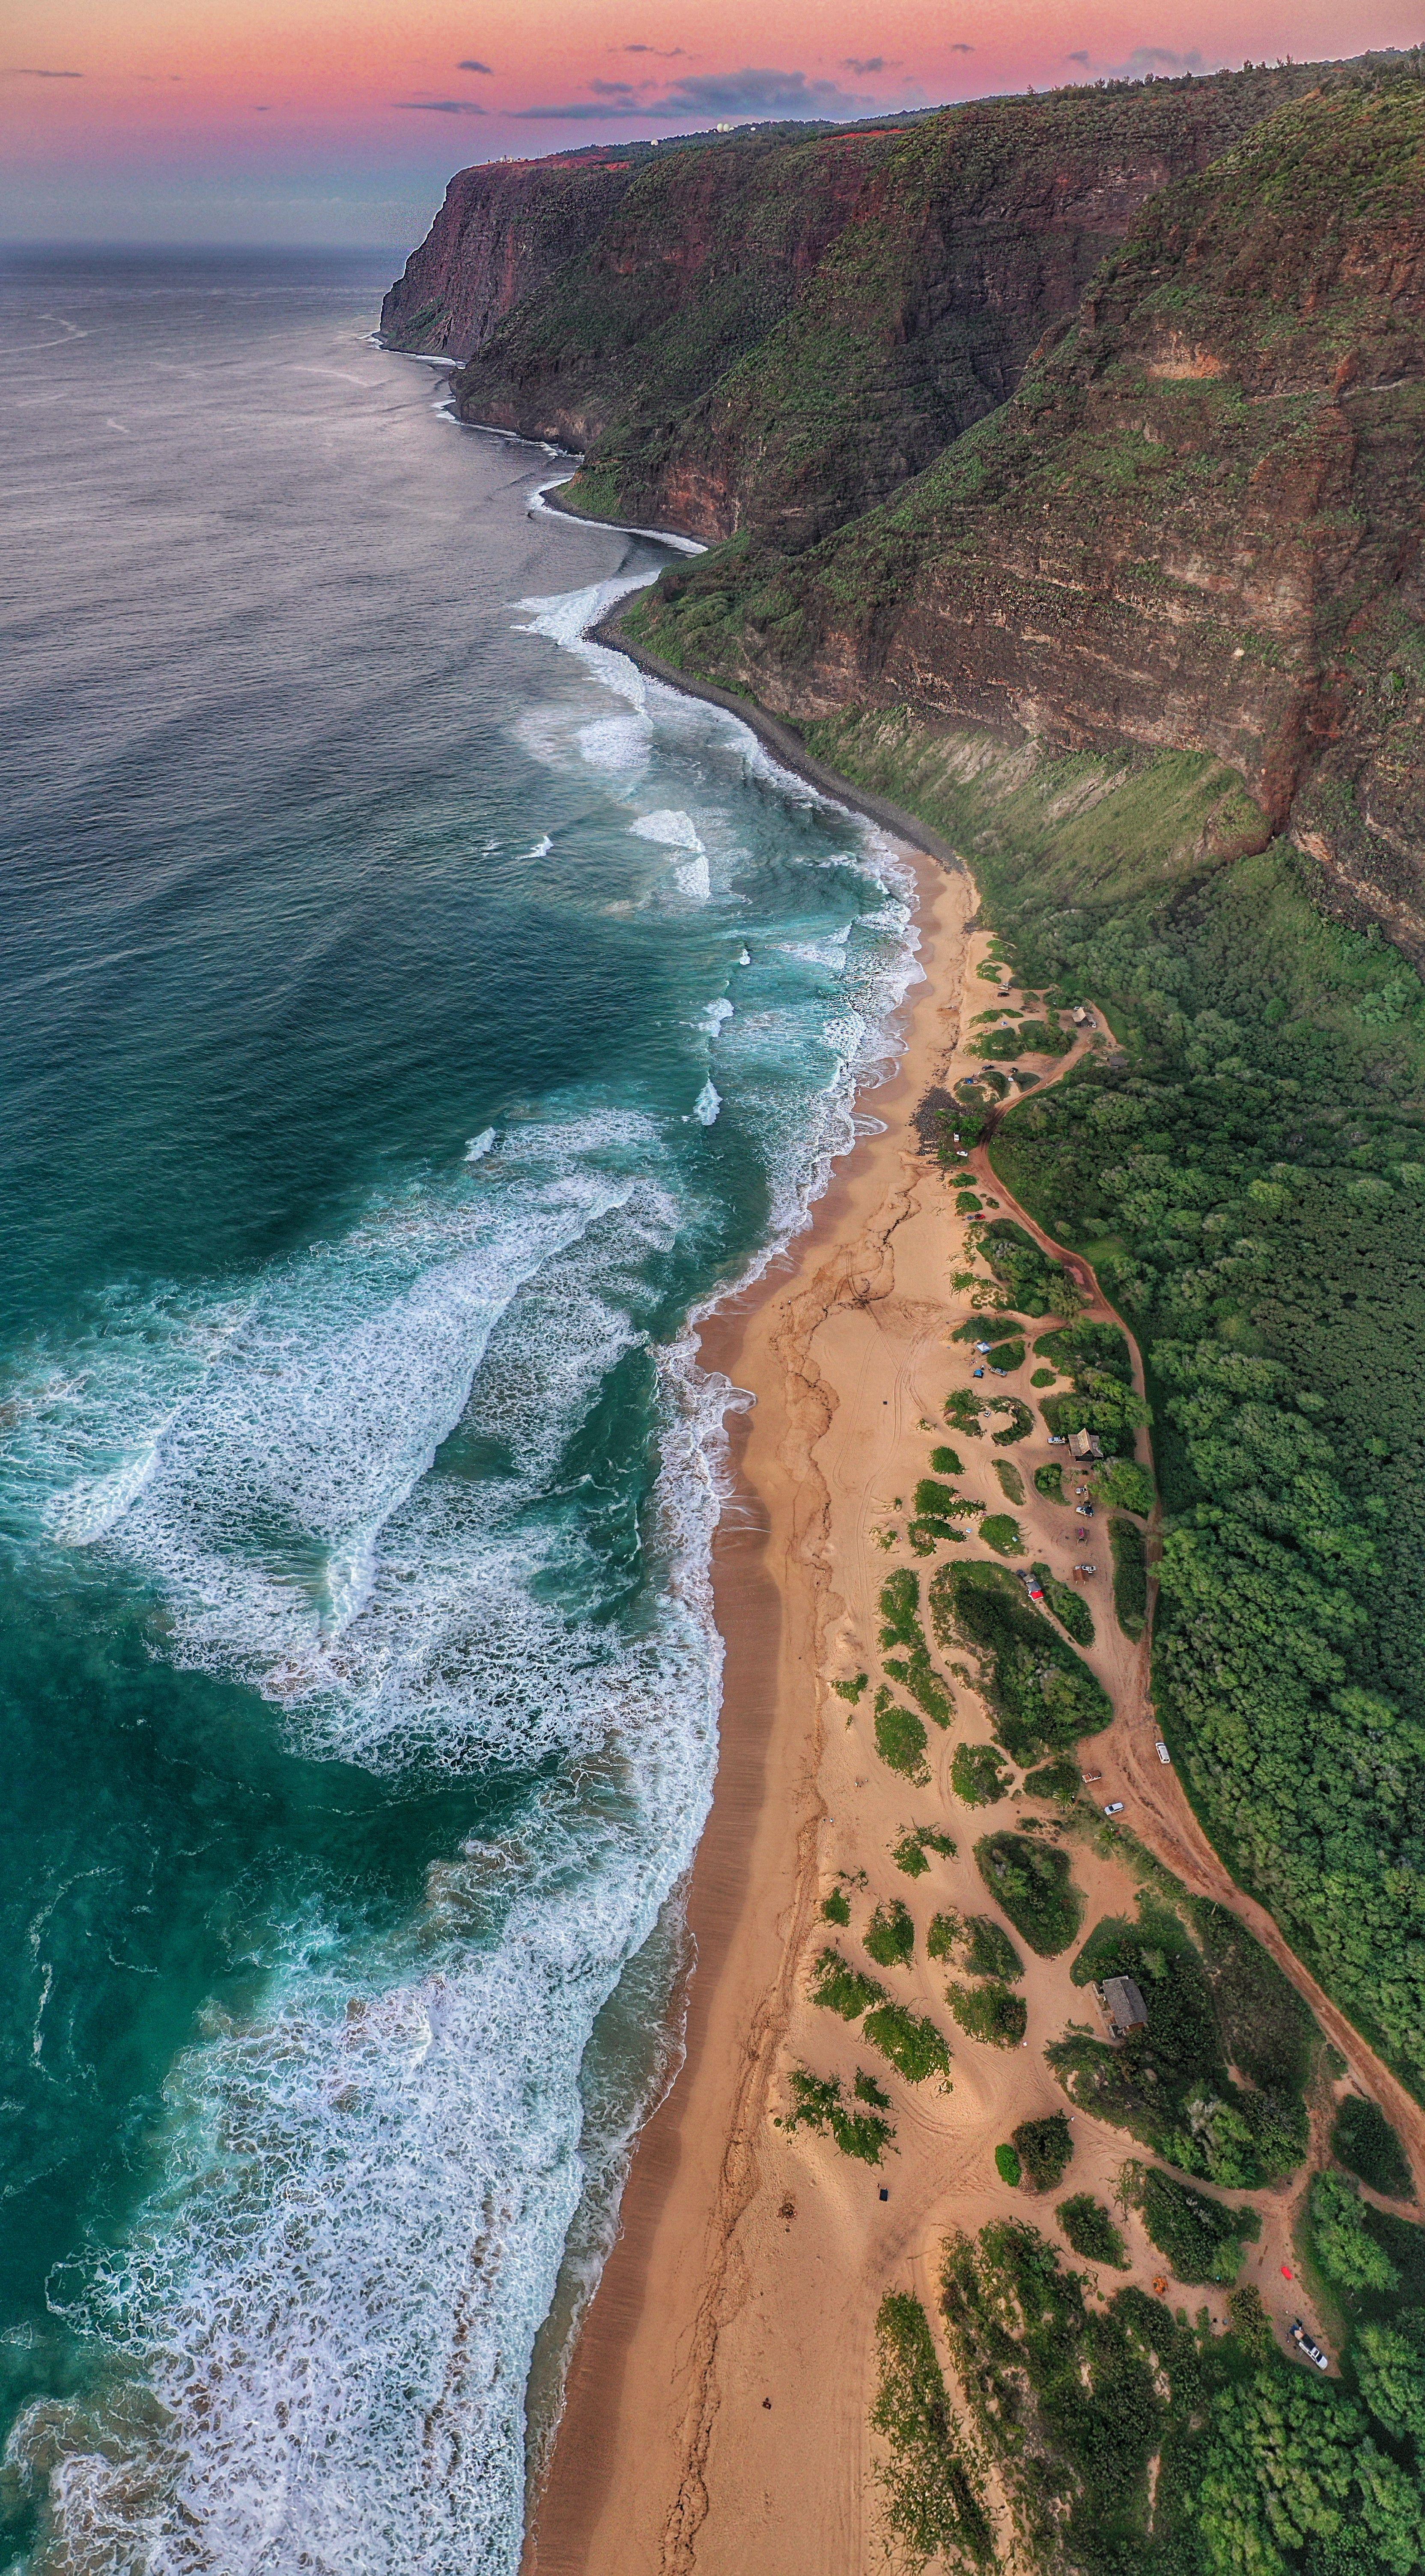 #napalicoast #kauai #hawaii